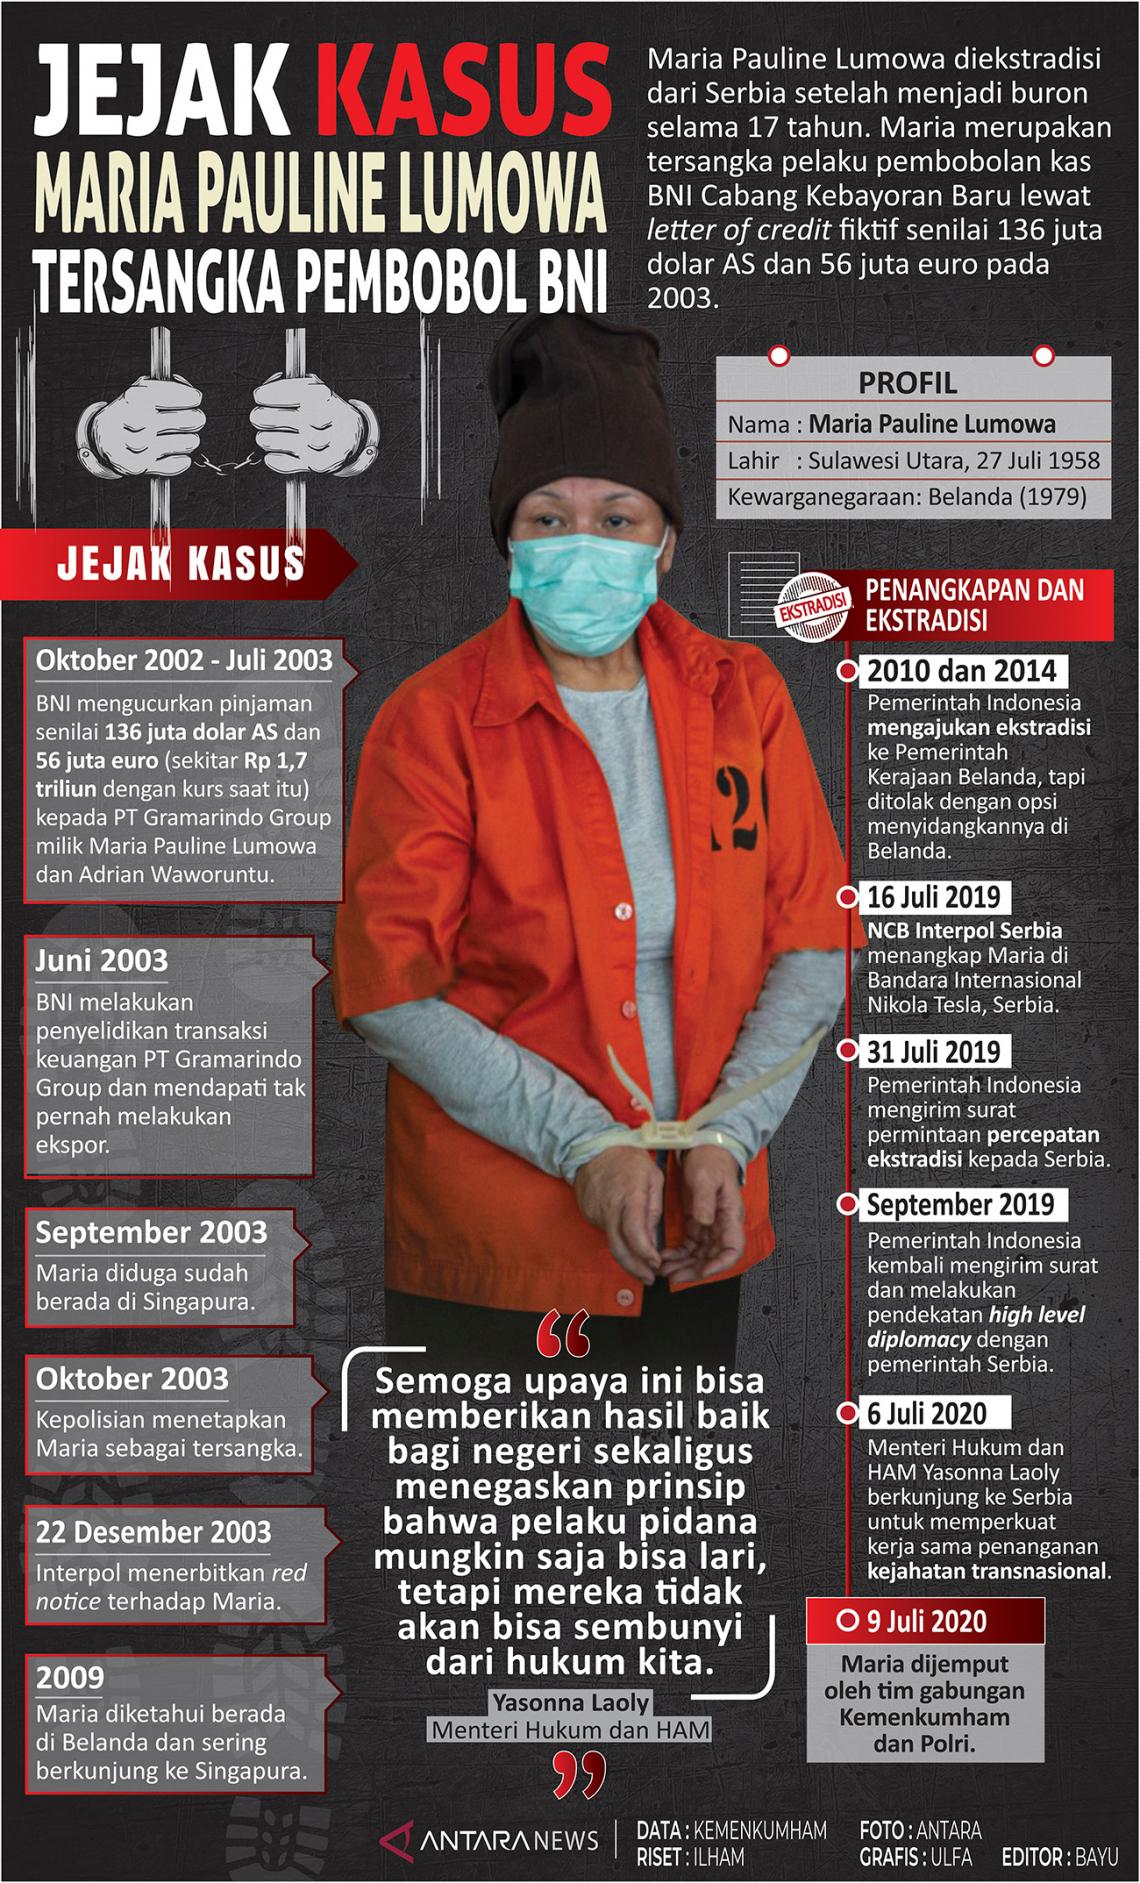 Jejak kasus Maria Pauline Lumowa